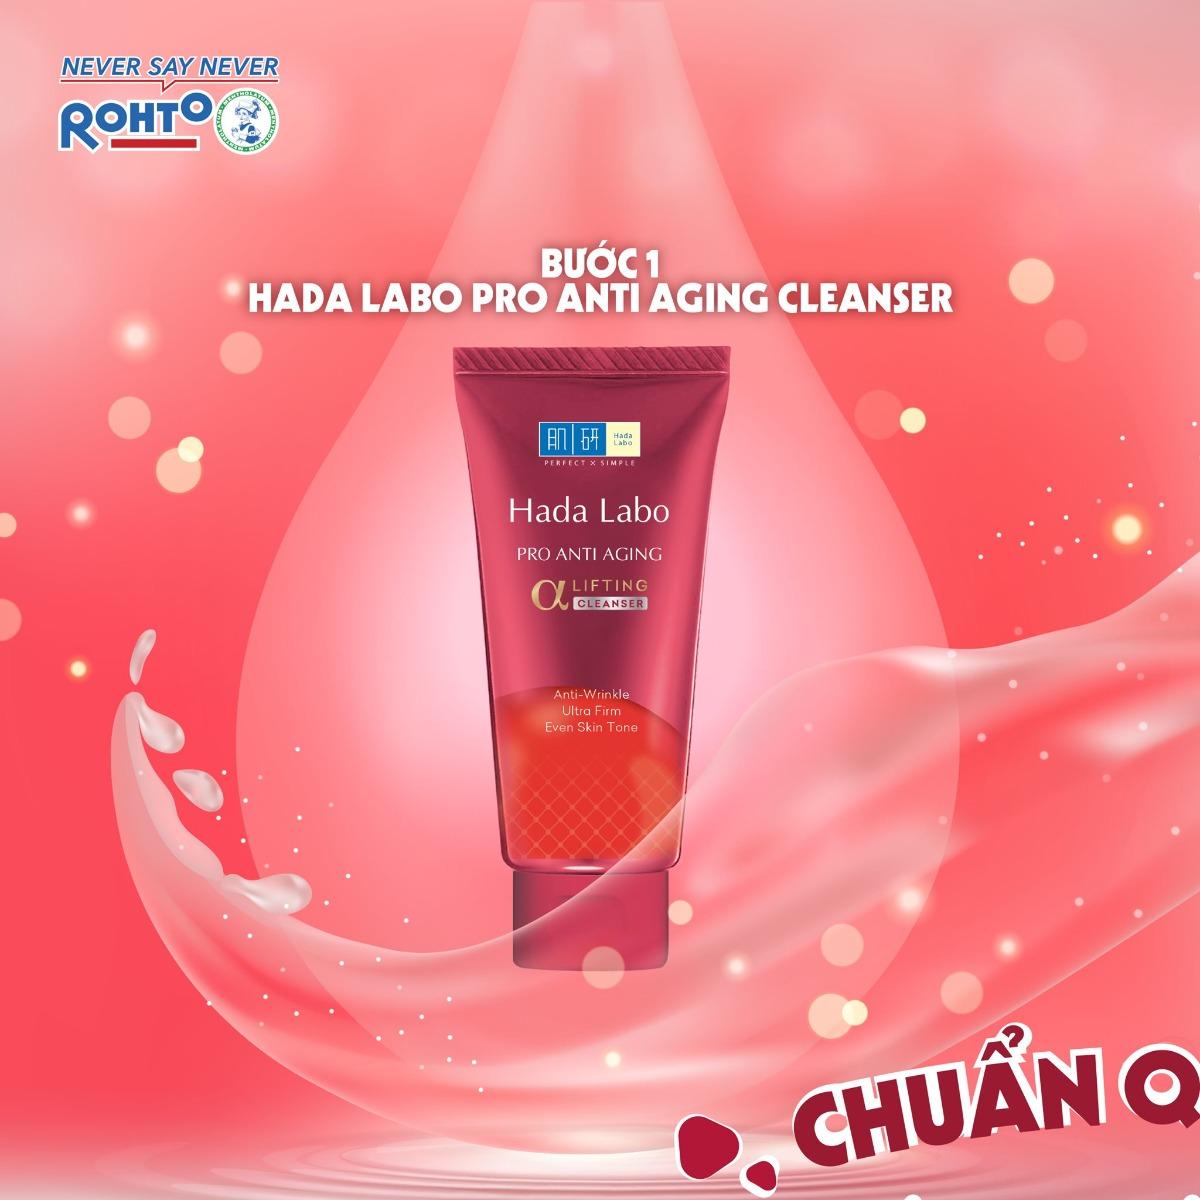 Kem Rửa Mặt Cải Thiện Lão Hóa Da Hada Labo Pro Anti Aging α Lifting Cleanser